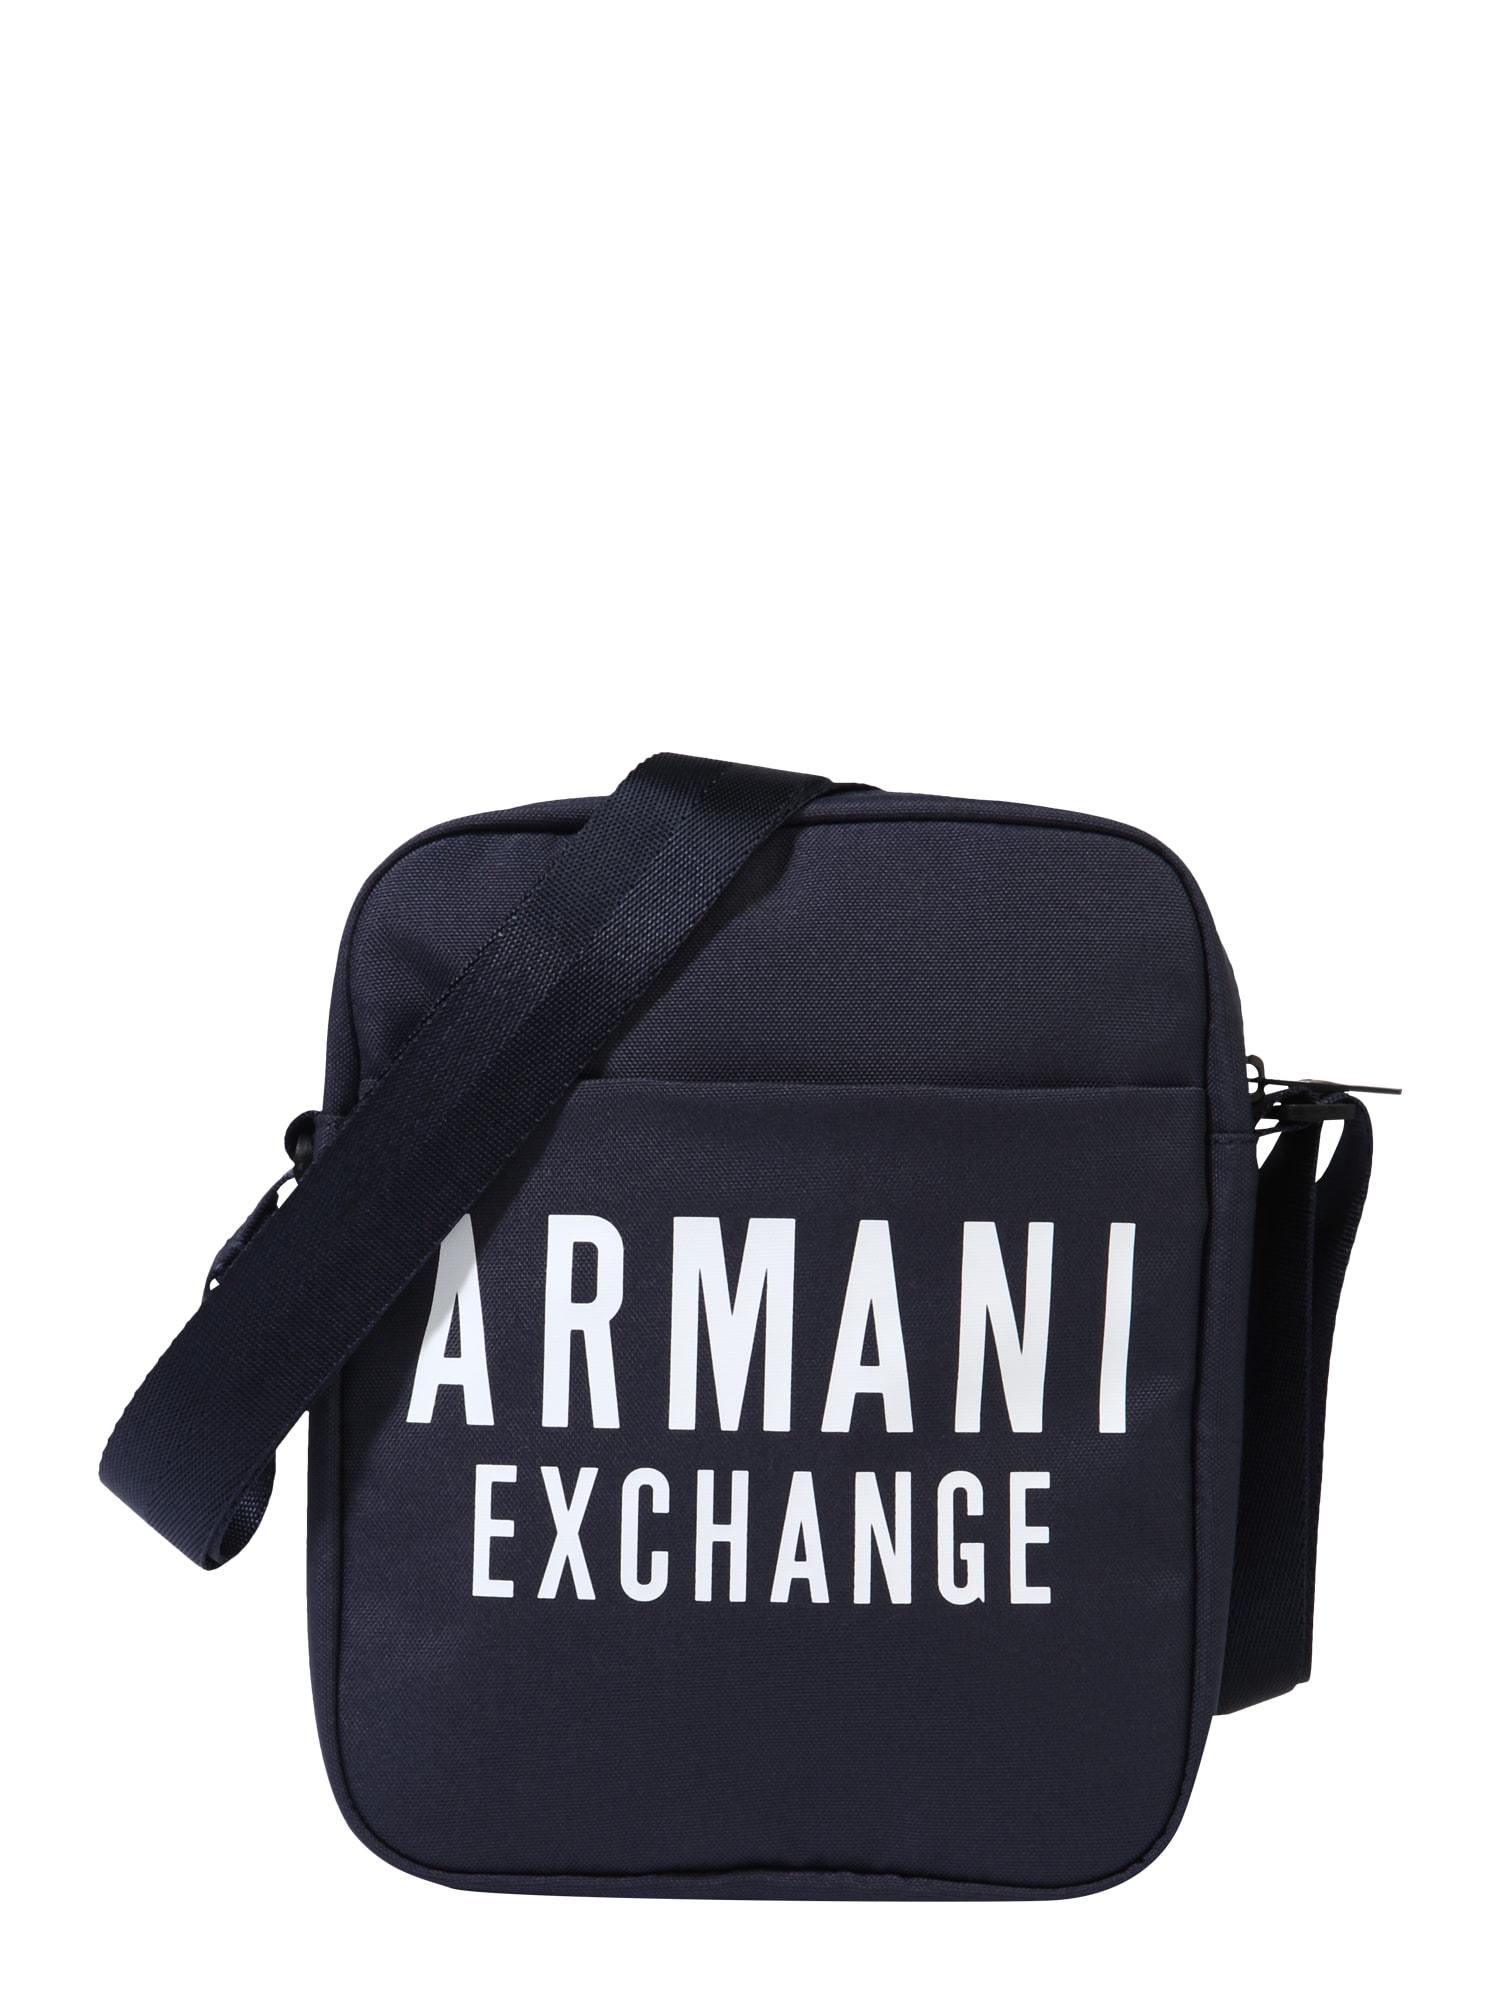 ARMANI EXCHANGE Rankinė su ilgu dirželiu tamsiai mėlyna / balta